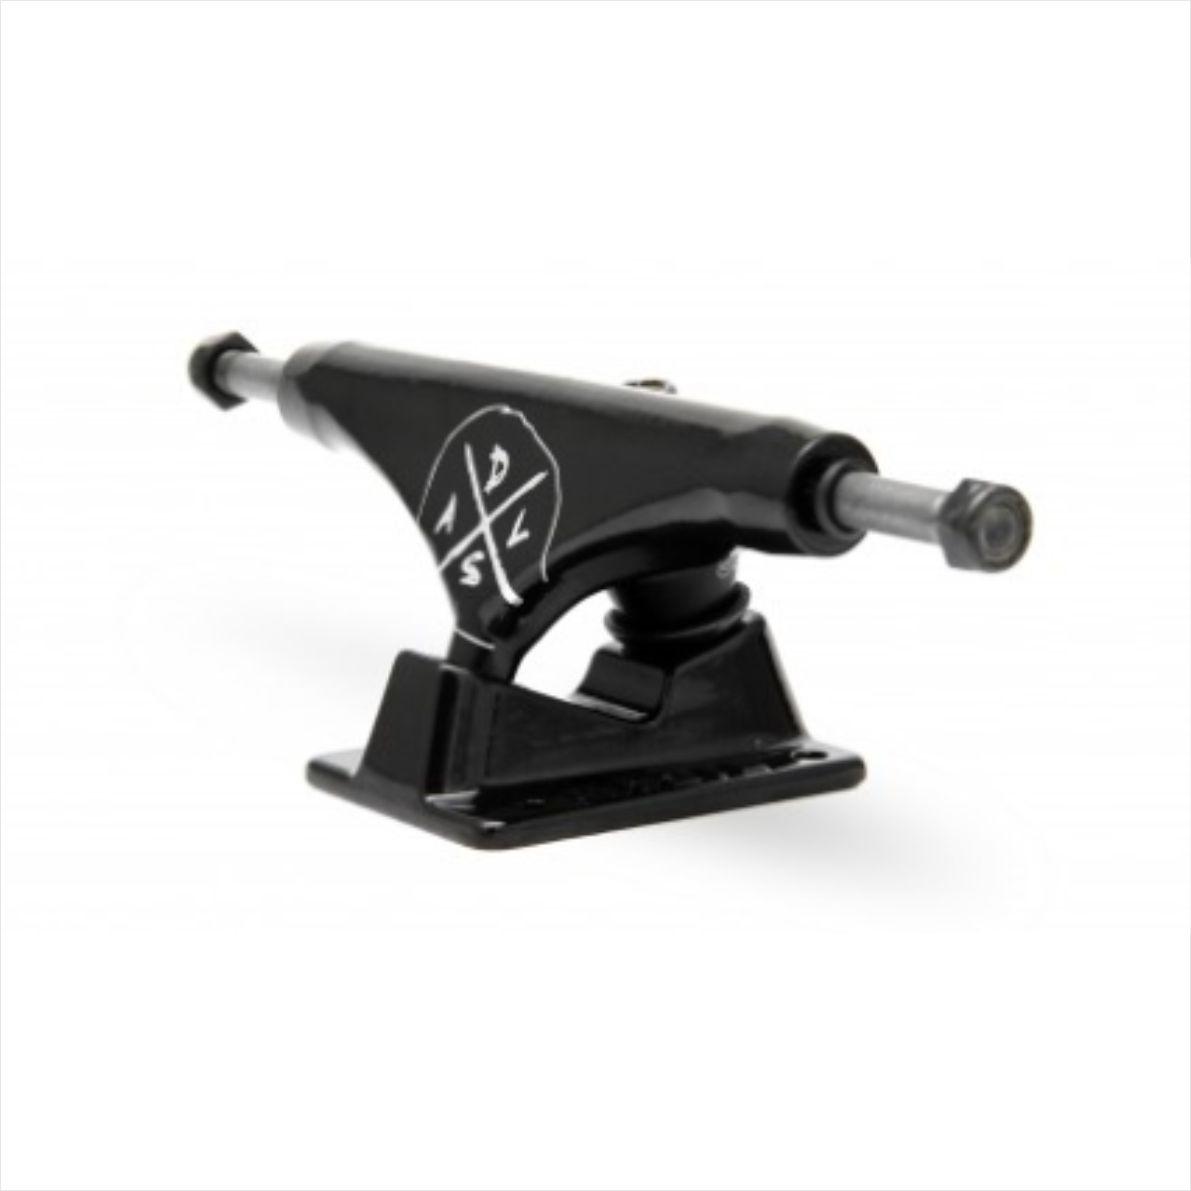 Truck Crail 136 Hi DSAL All Black  - No Comply Skate Shop